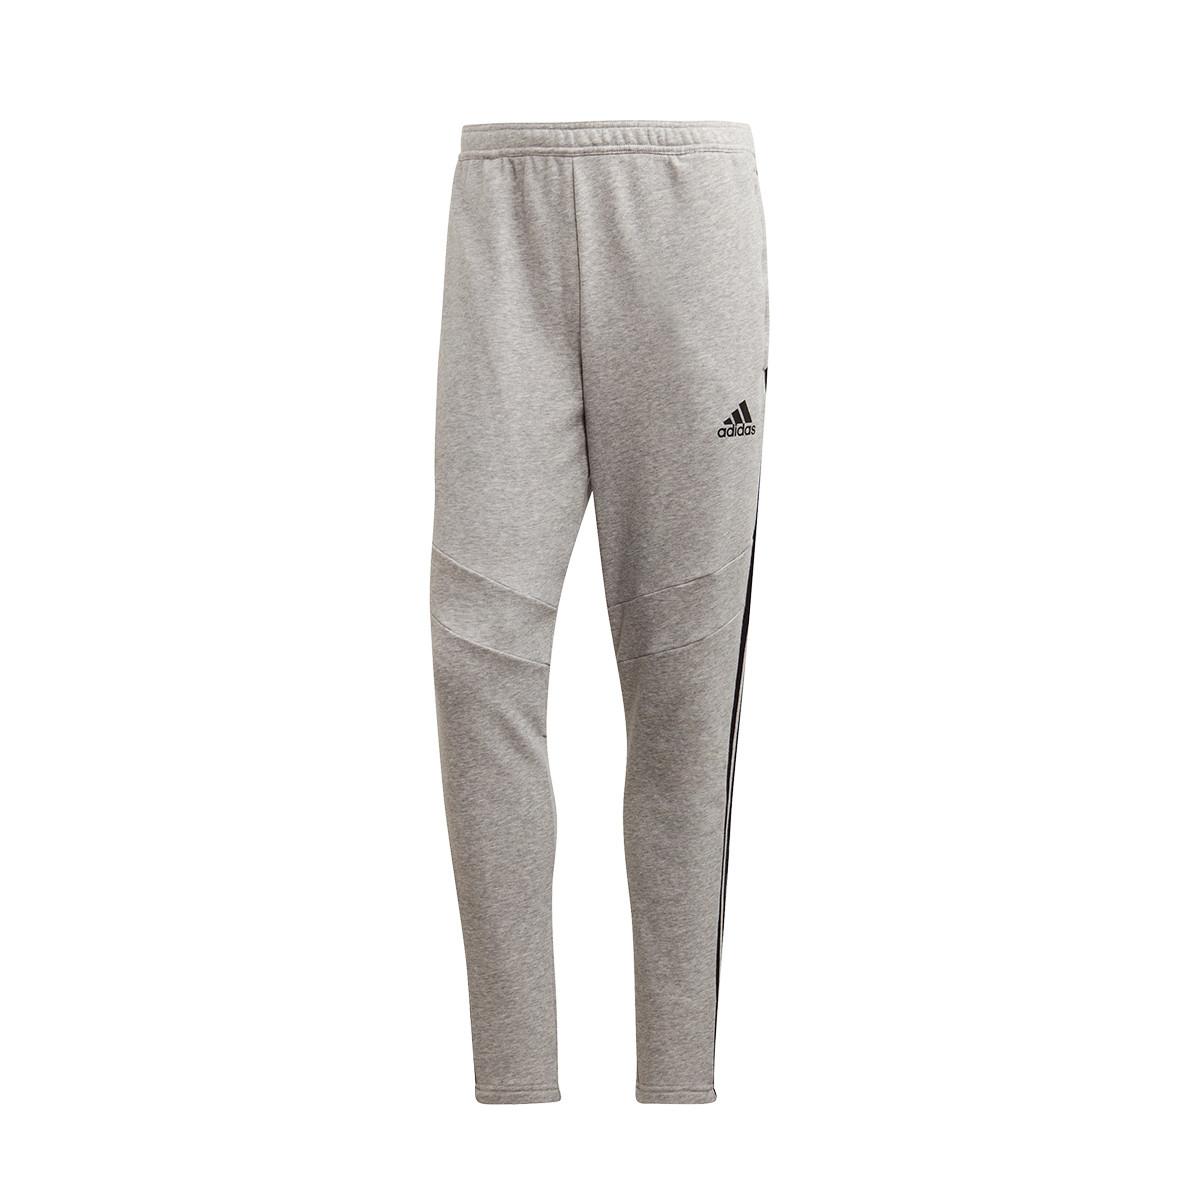 قلب المخالفات تفرز Pantalones Adidas Futbol Largos Futuremortars Com